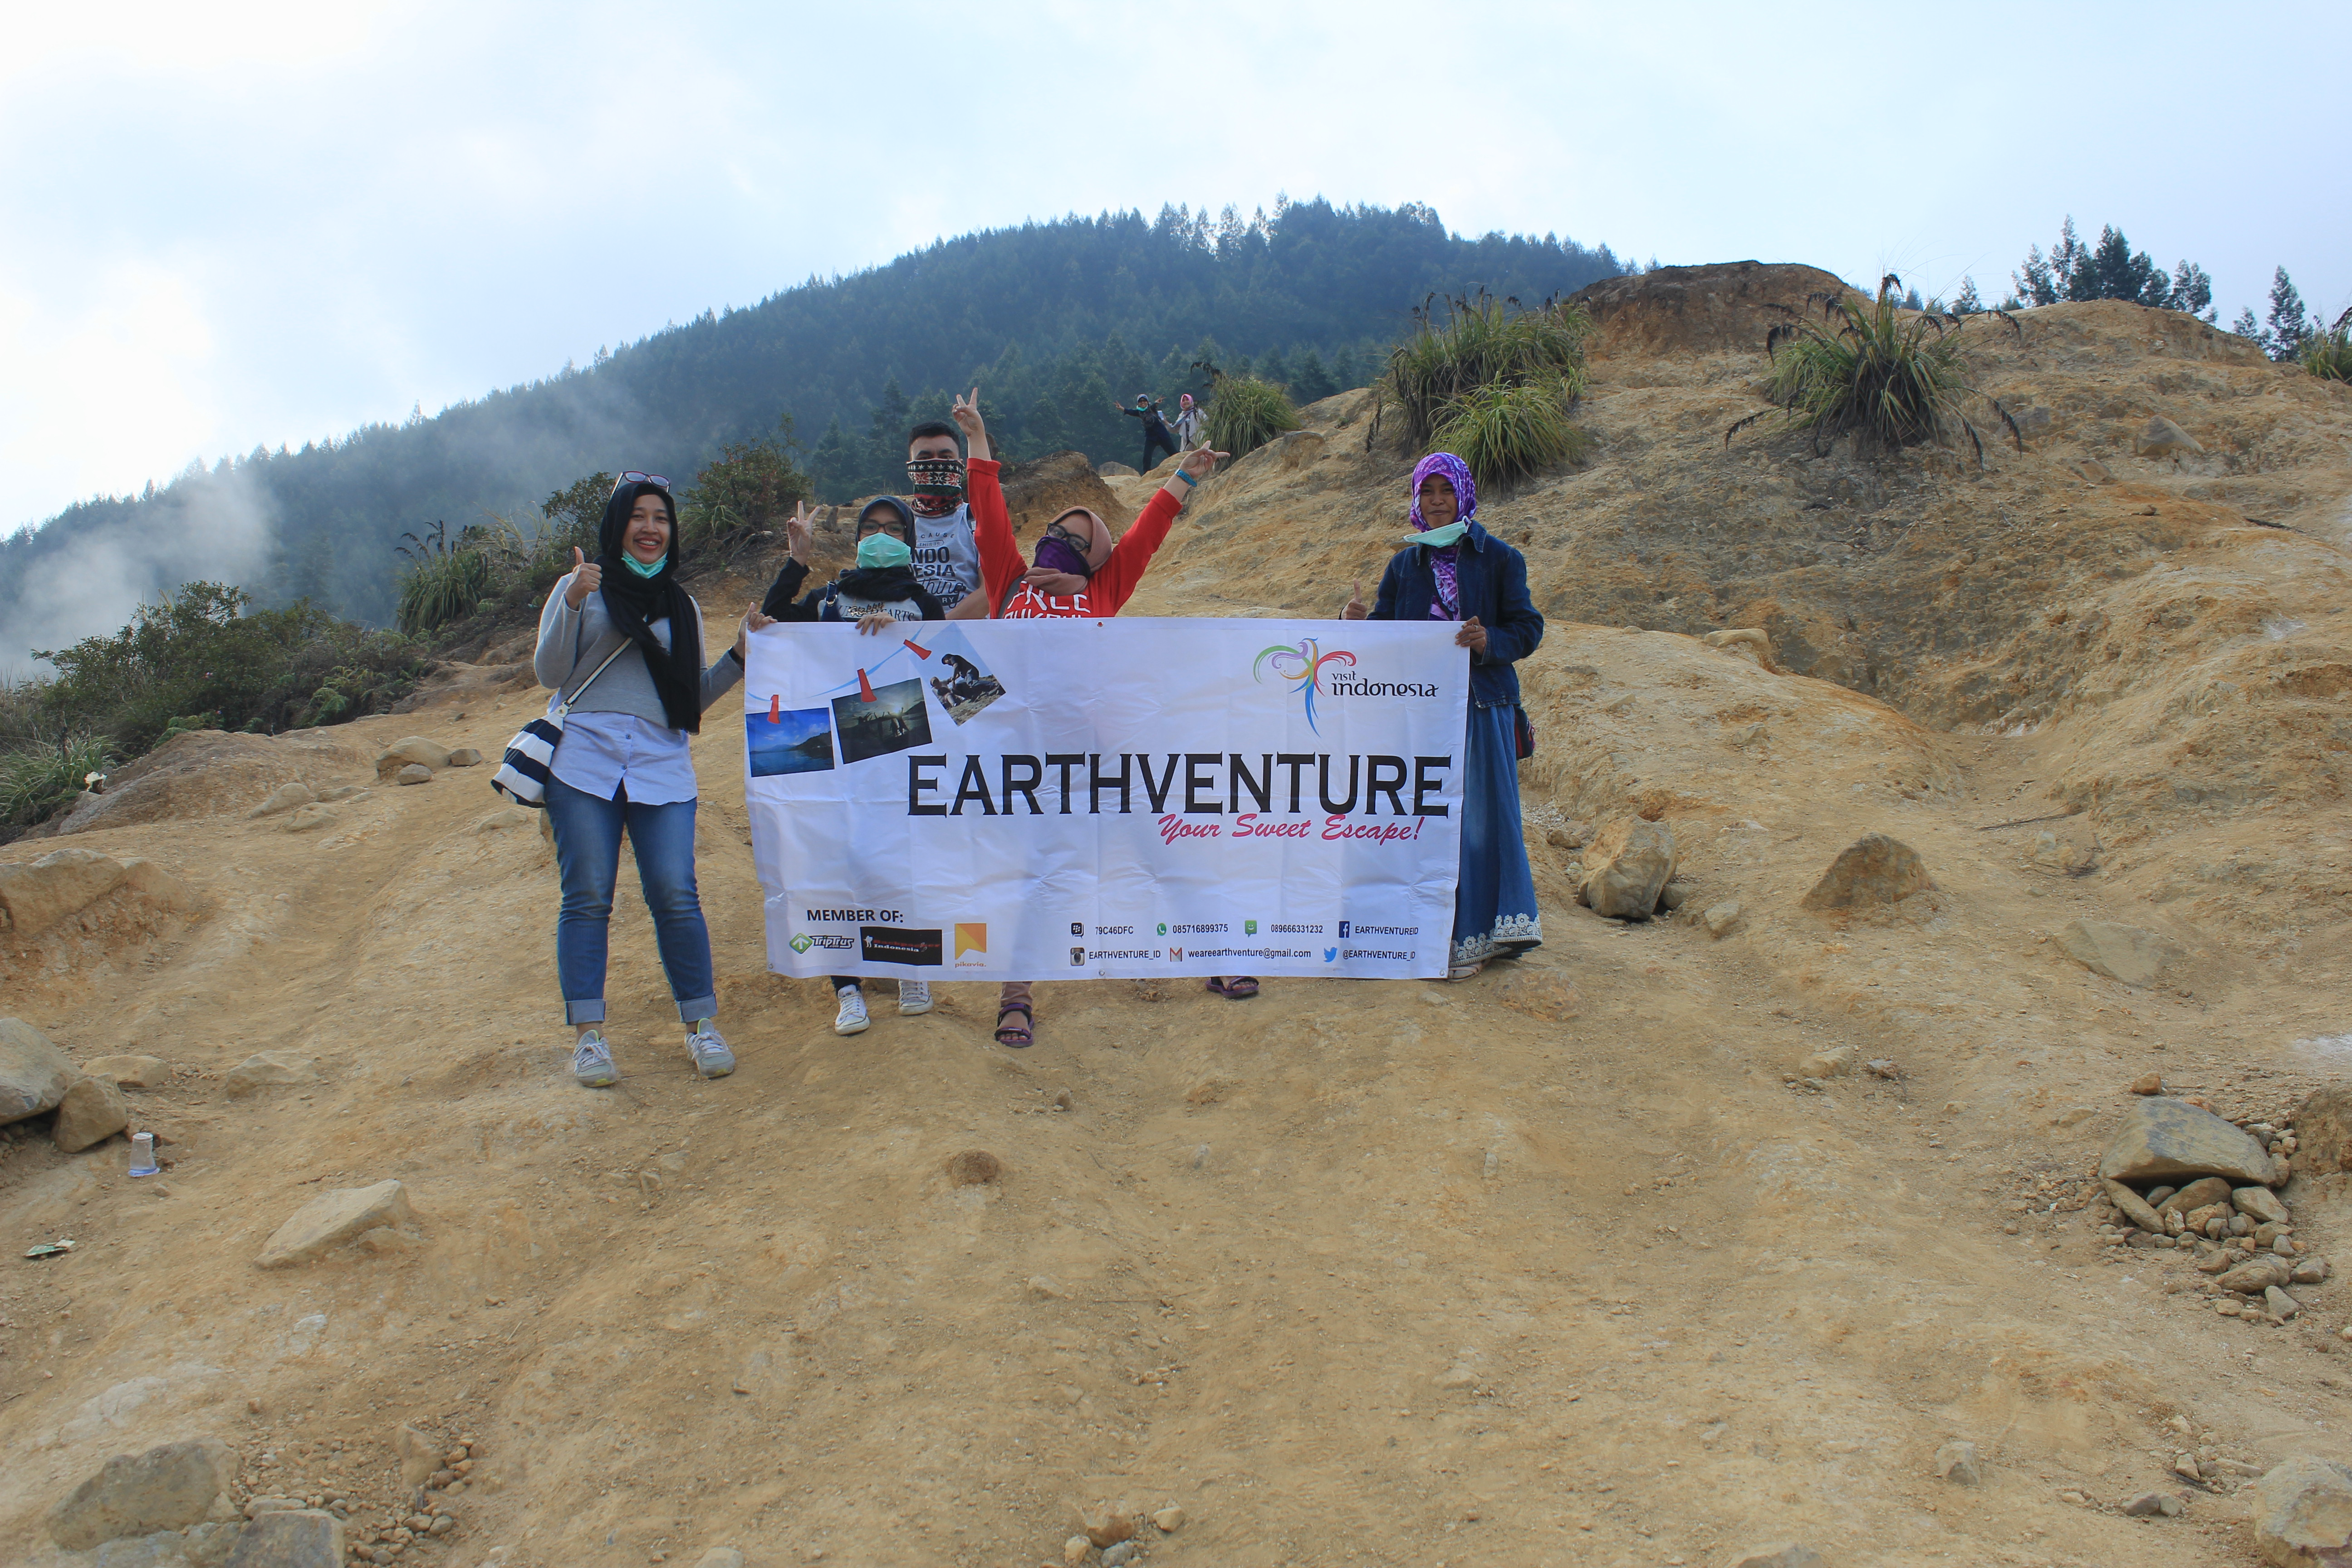 Earthventure Indonesia image